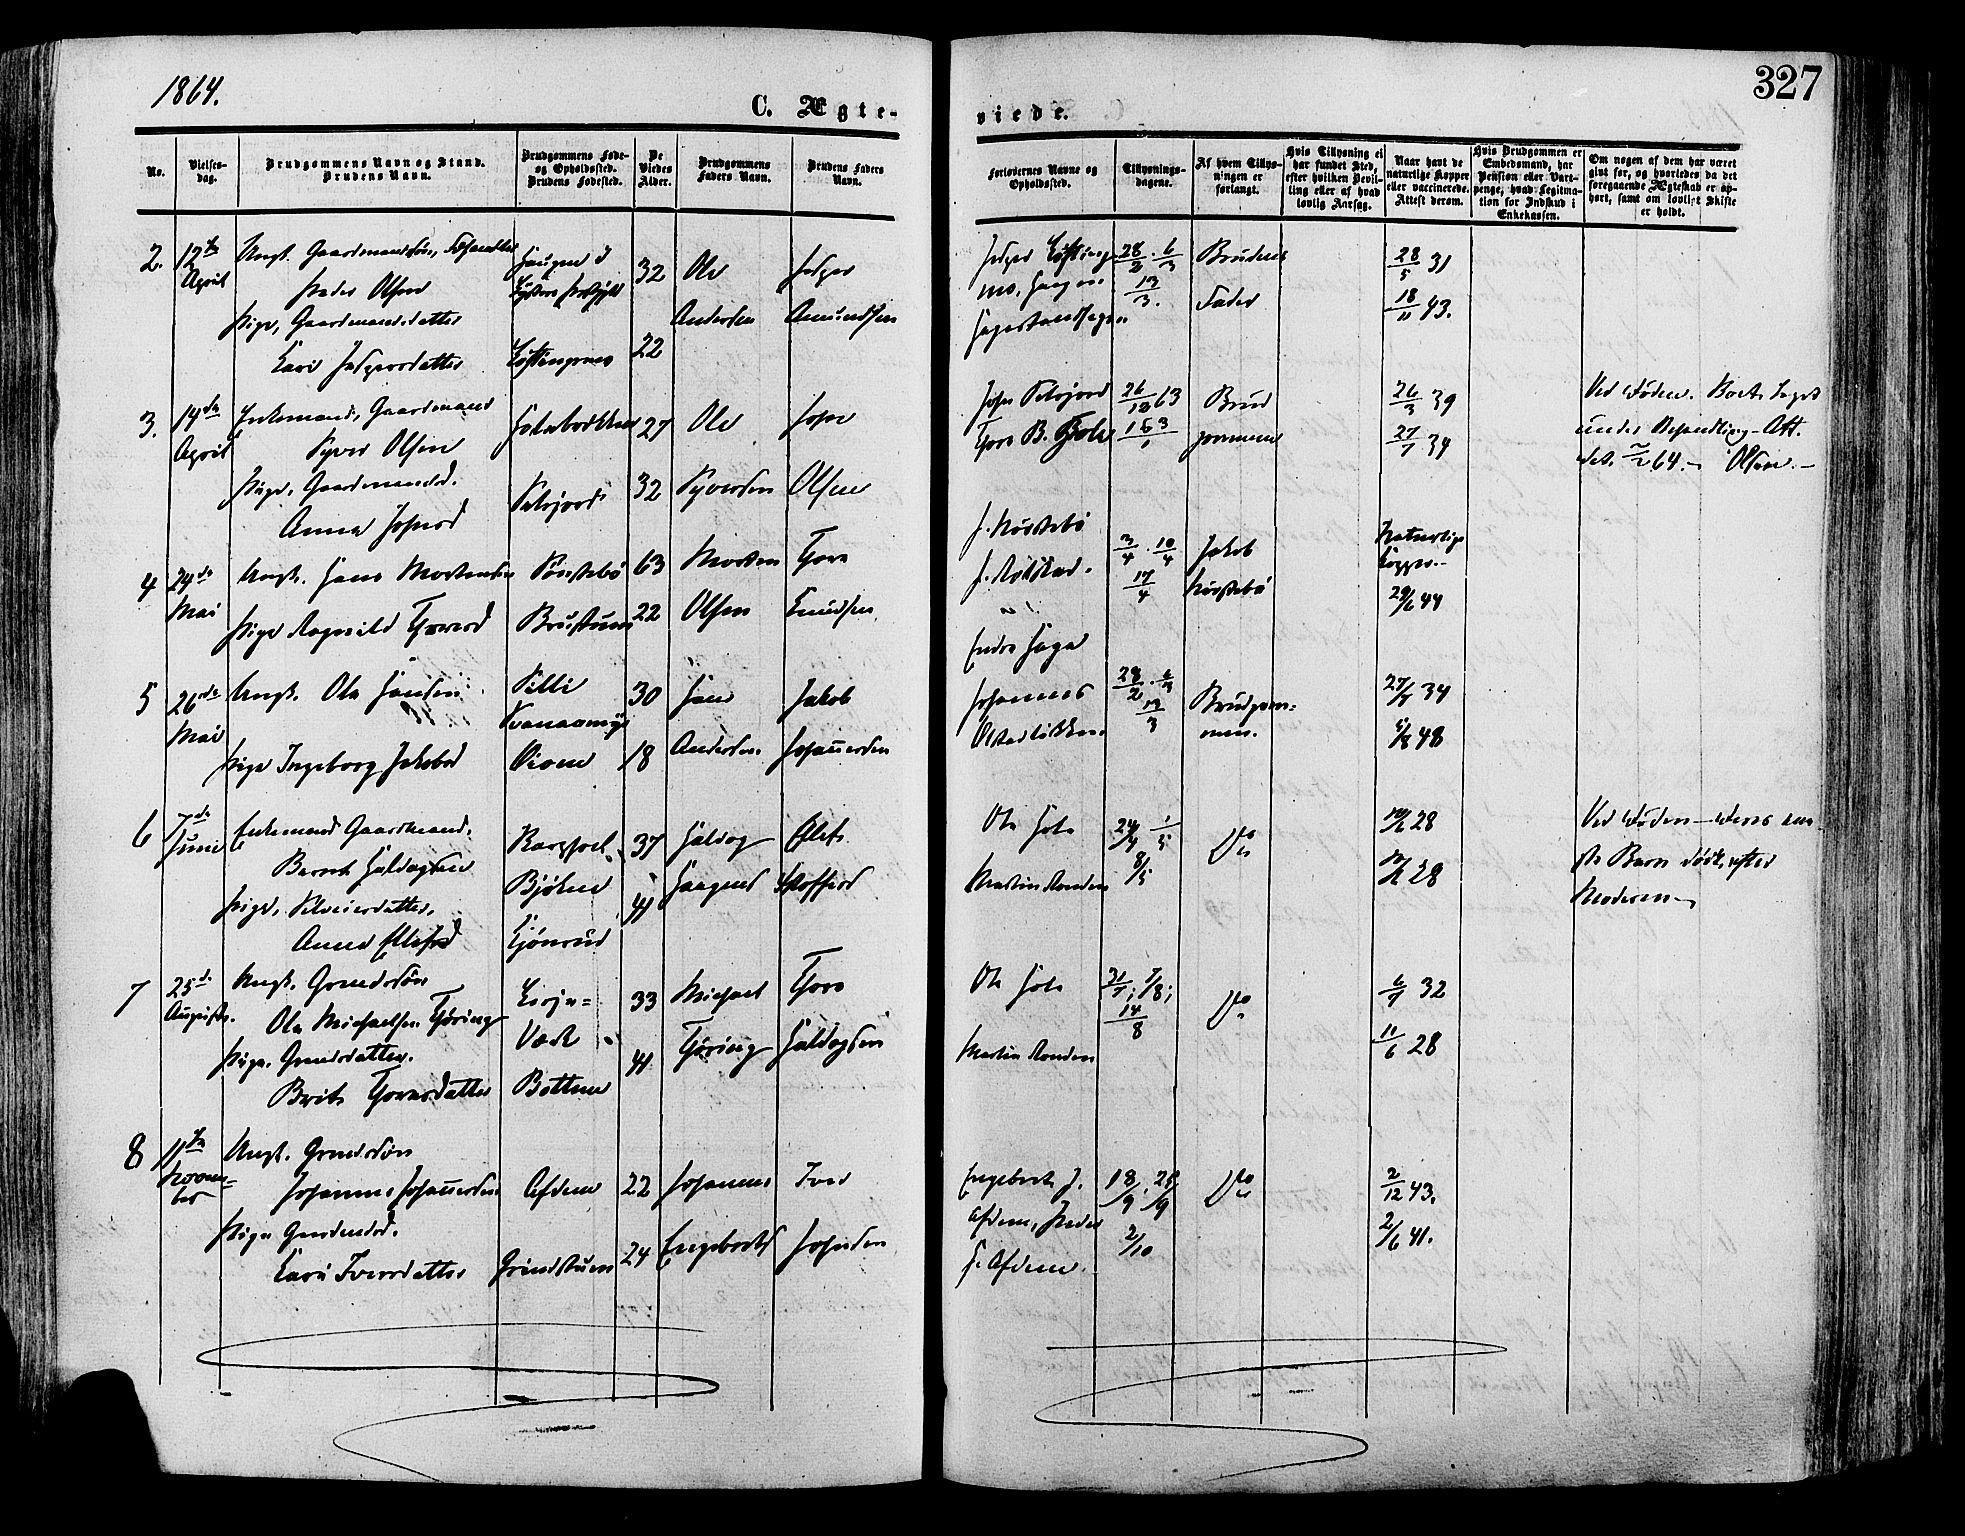 SAH, Lesja prestekontor, Ministerialbok nr. 8, 1854-1880, s. 327